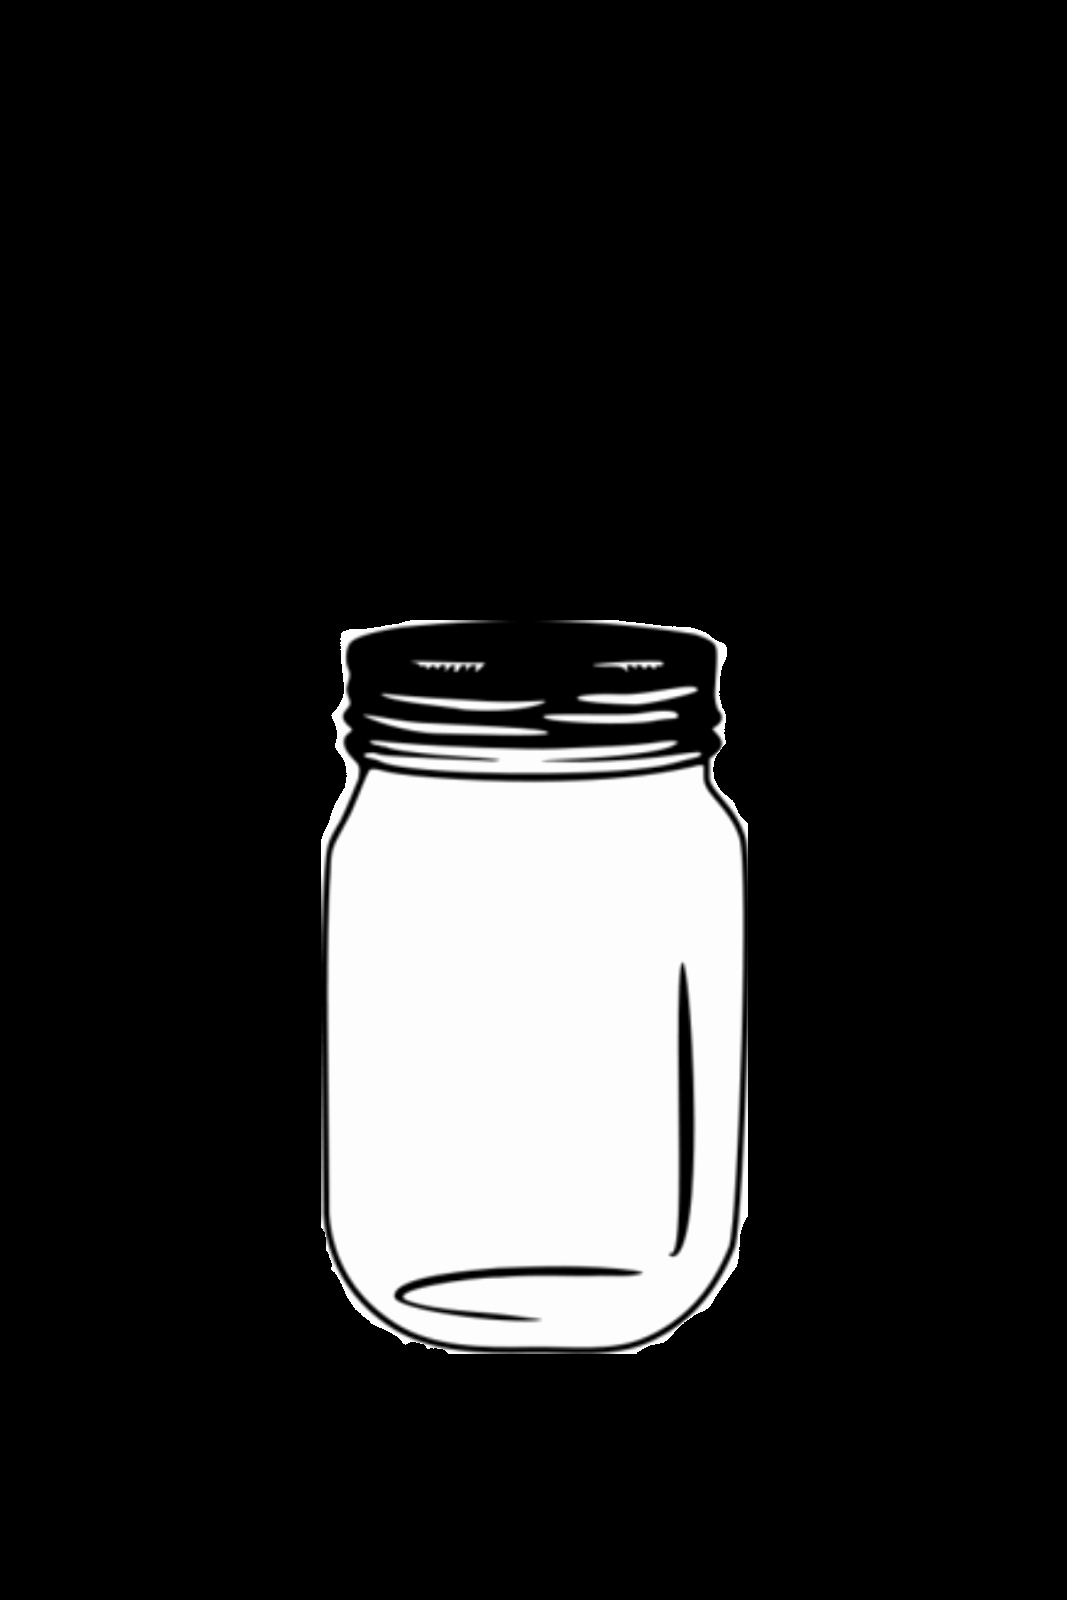 Printable Mason Jar Template Best Of Best S Of Mason Jar Cut Out Template Mason Jar